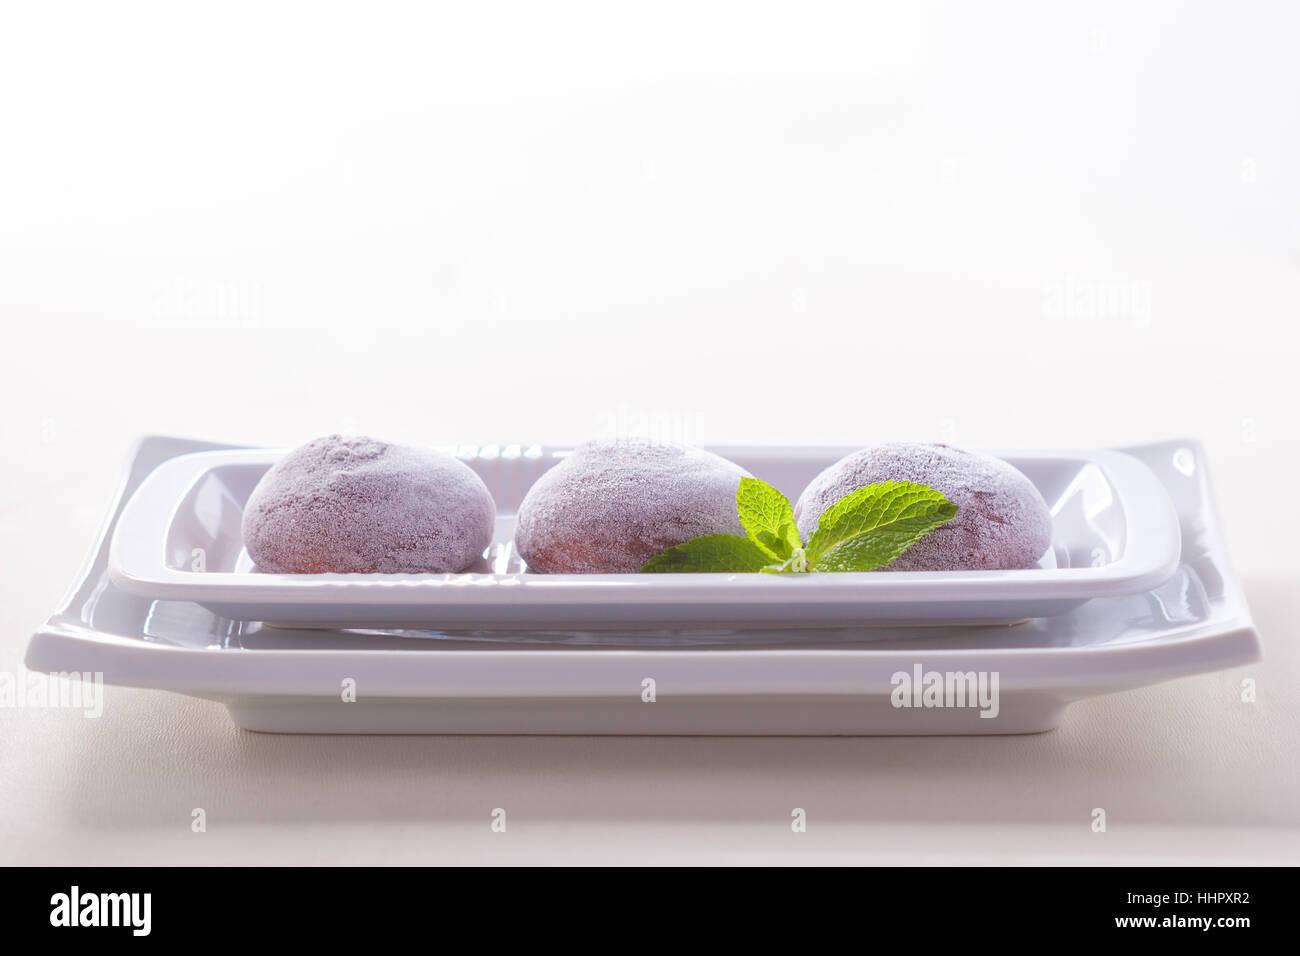 Chocolate coconut mochi ice cream on white background - Stock Image